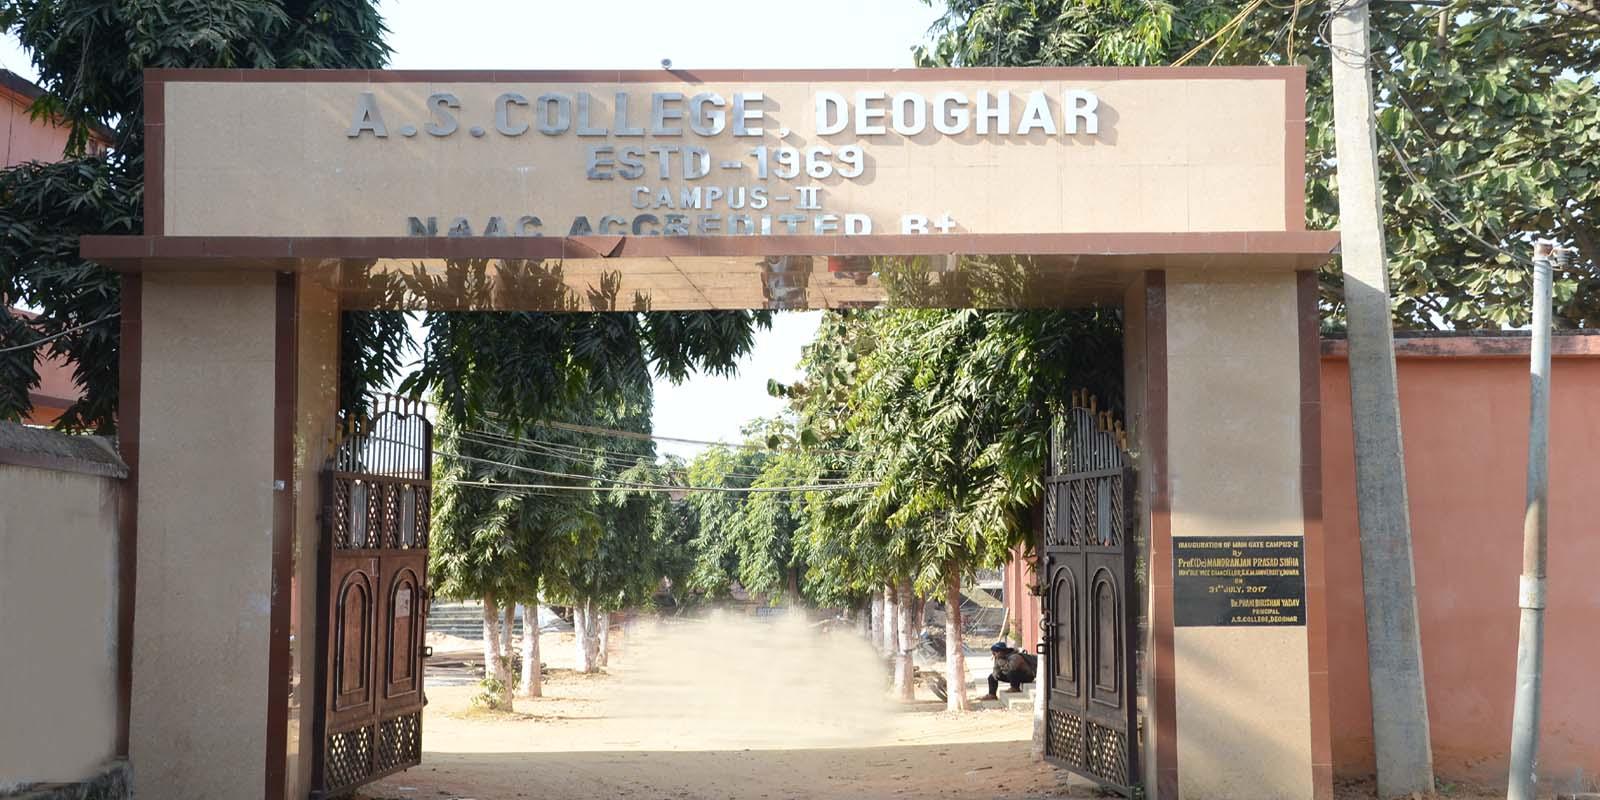 A.S. College, Deoghar